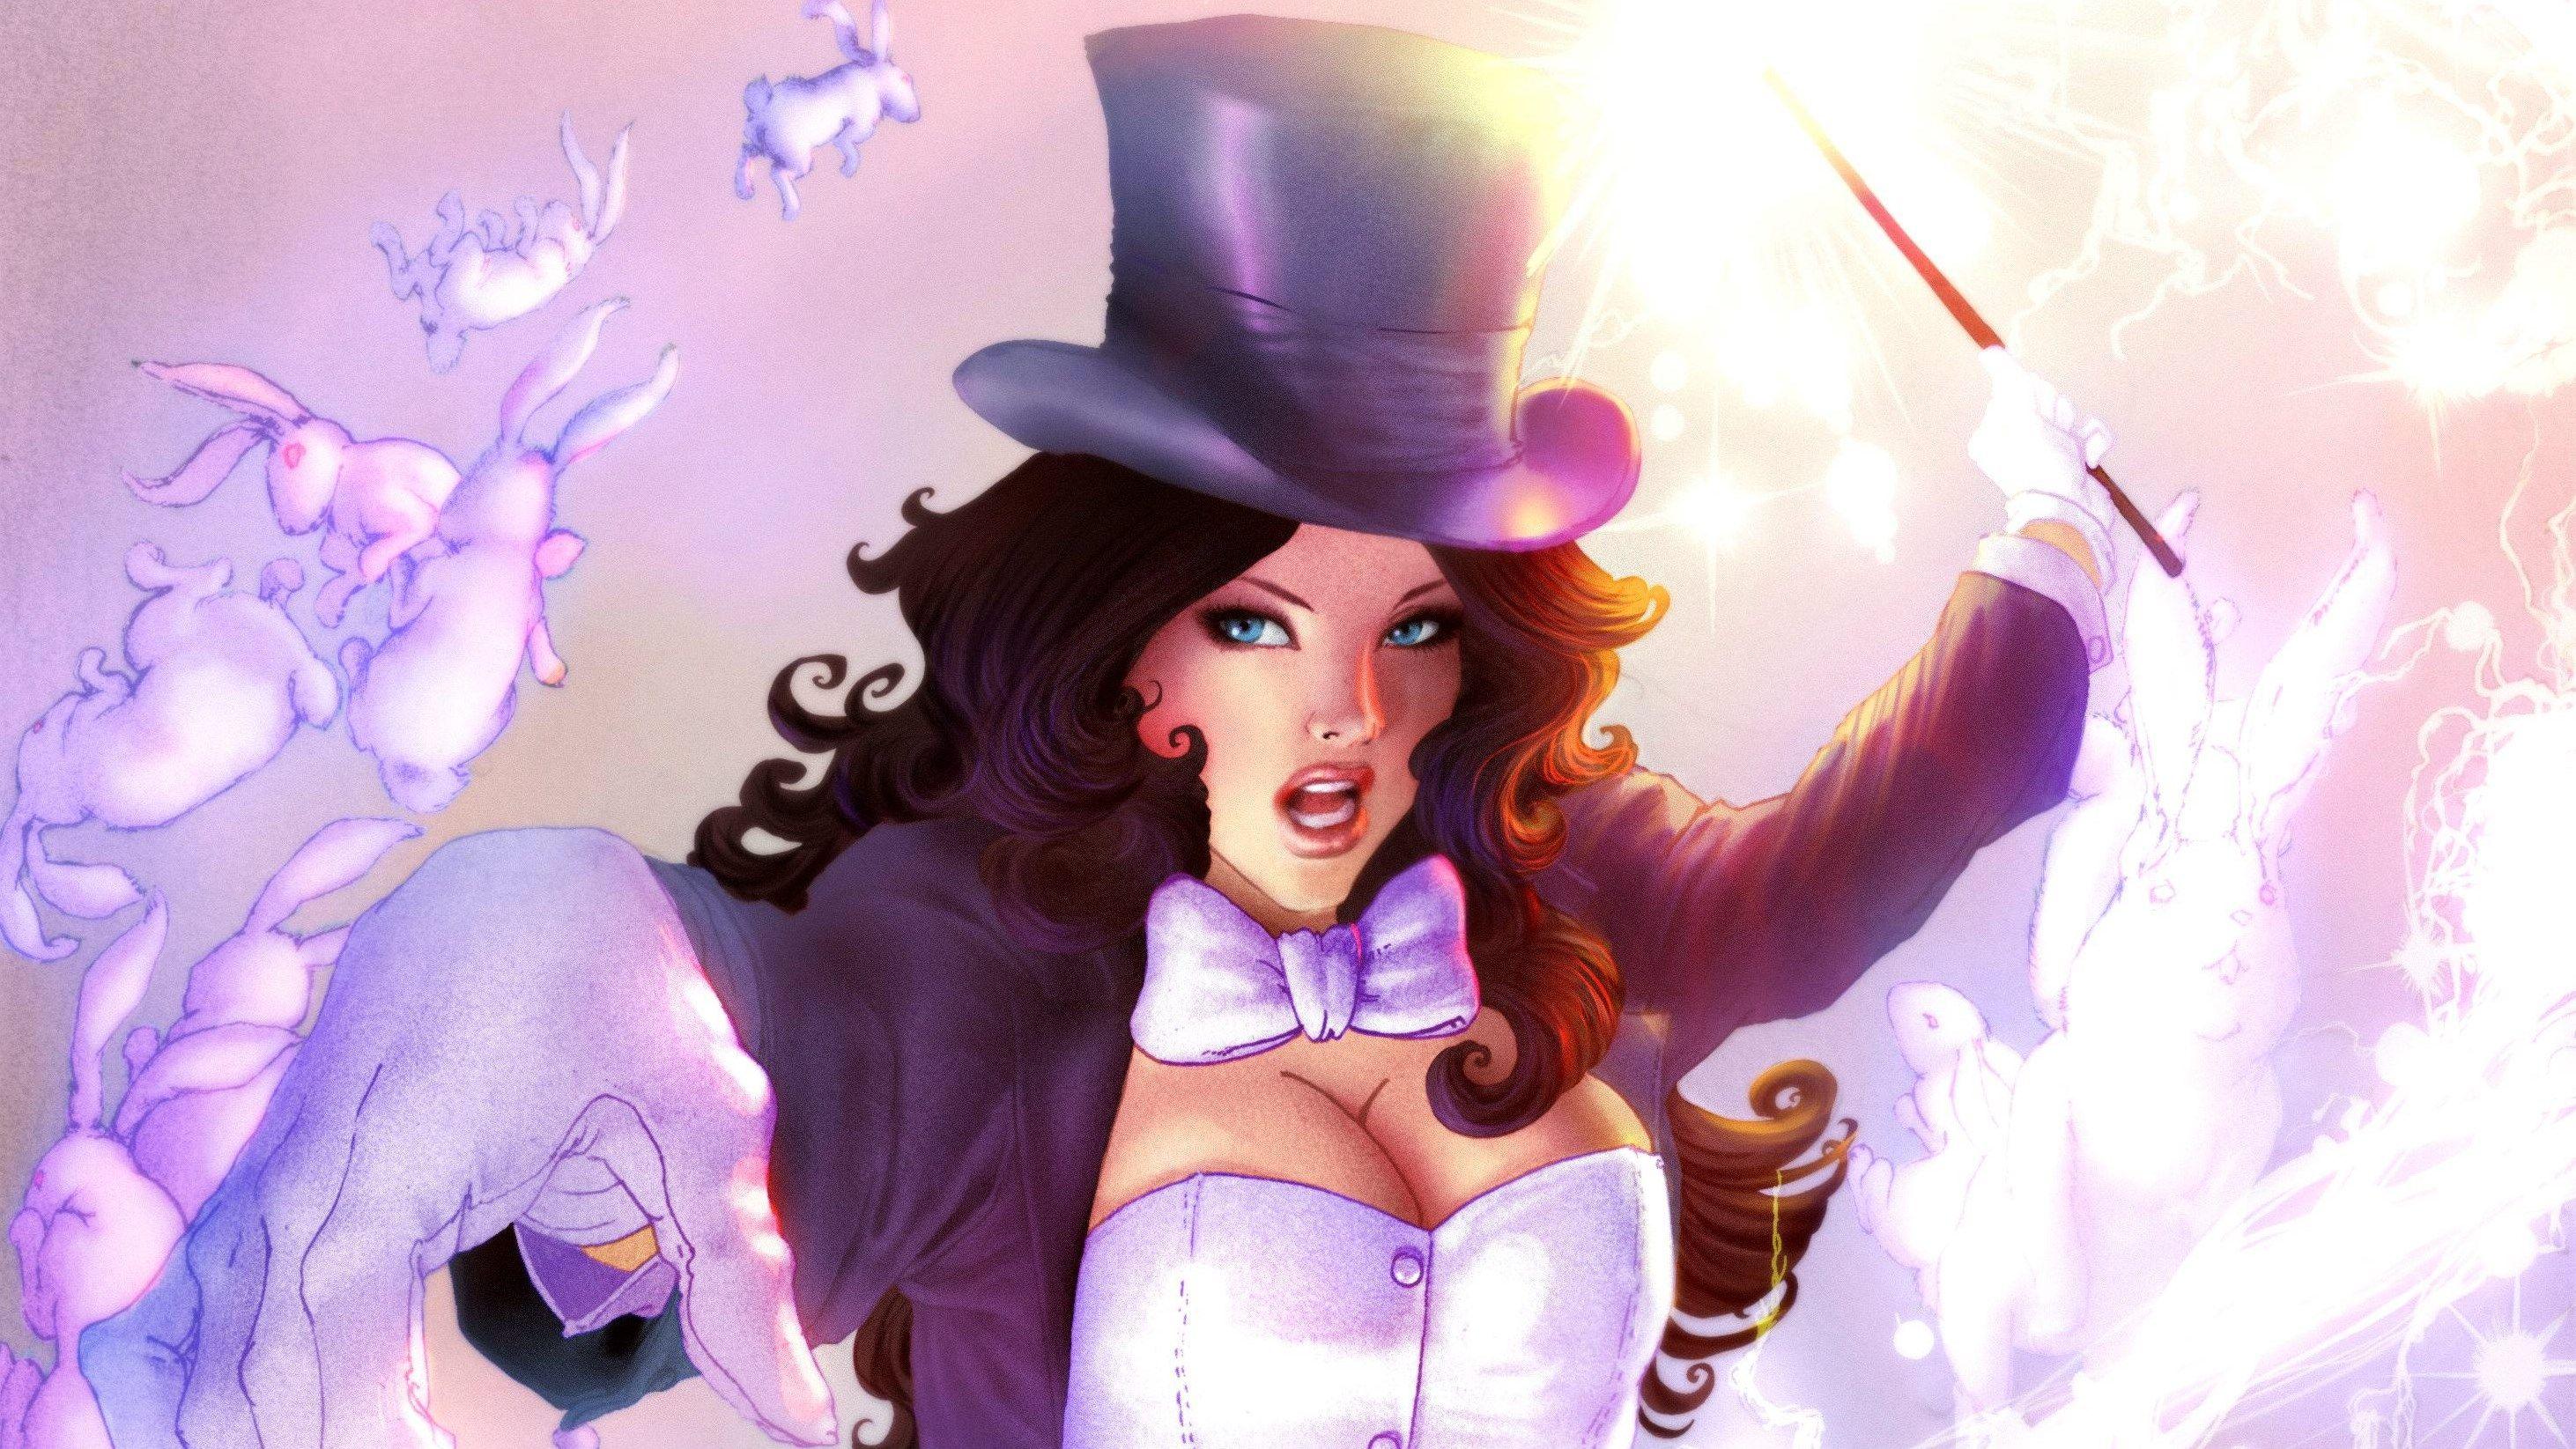 High Resolution Wallpapers Zatanna Picture Tempest Waite 2924x1645 Dc Comics Wallpaper Dc Comics Art Epic Hero